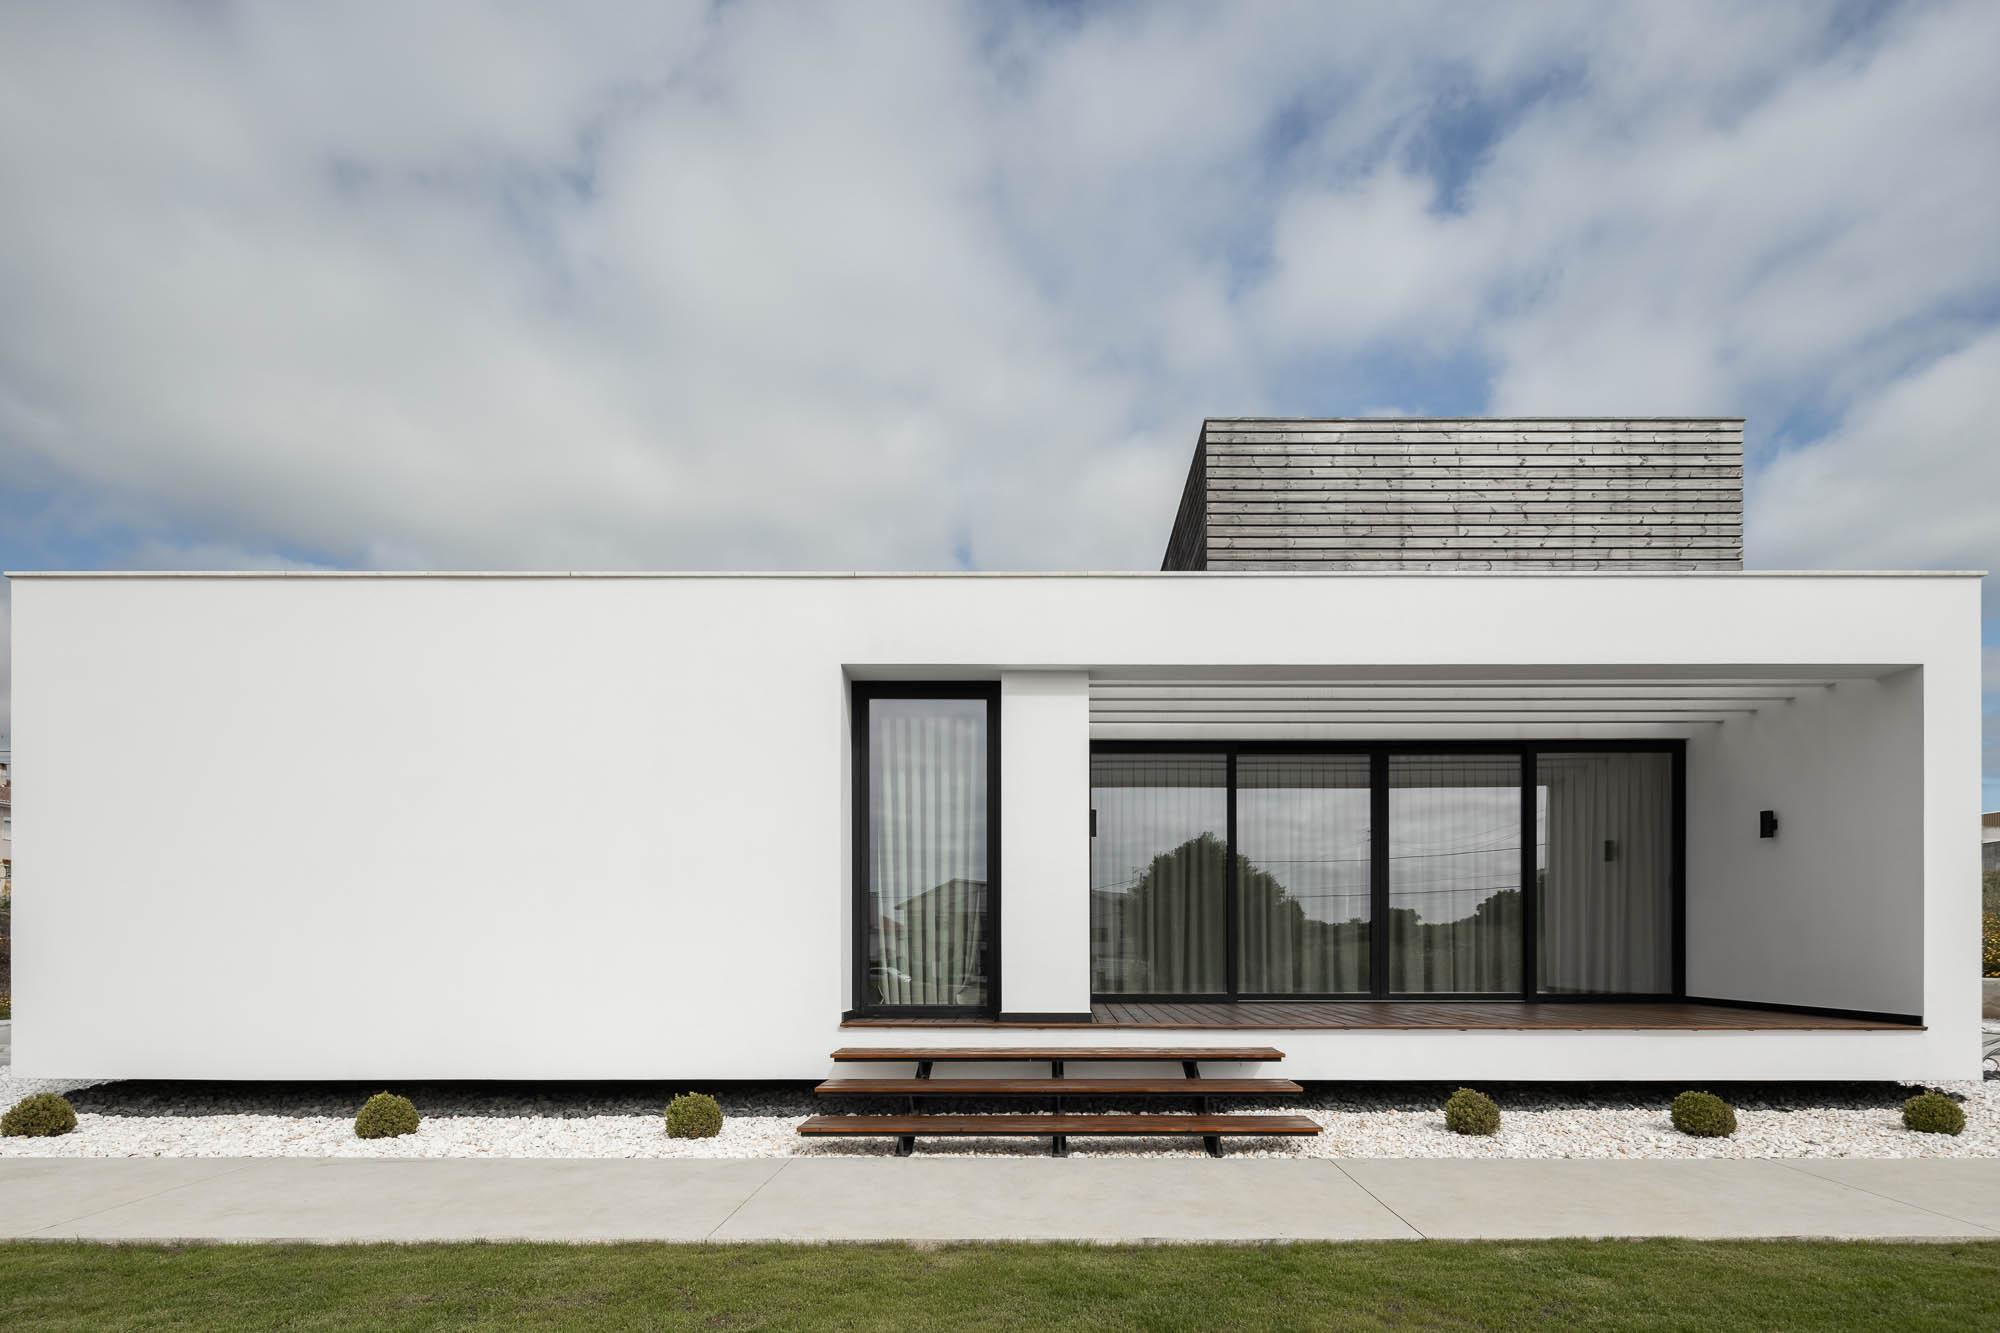 Arquitectura Arquitetura Arquitecto Arquiteto Casa Moradia Architecture Architect Estoril House Housing